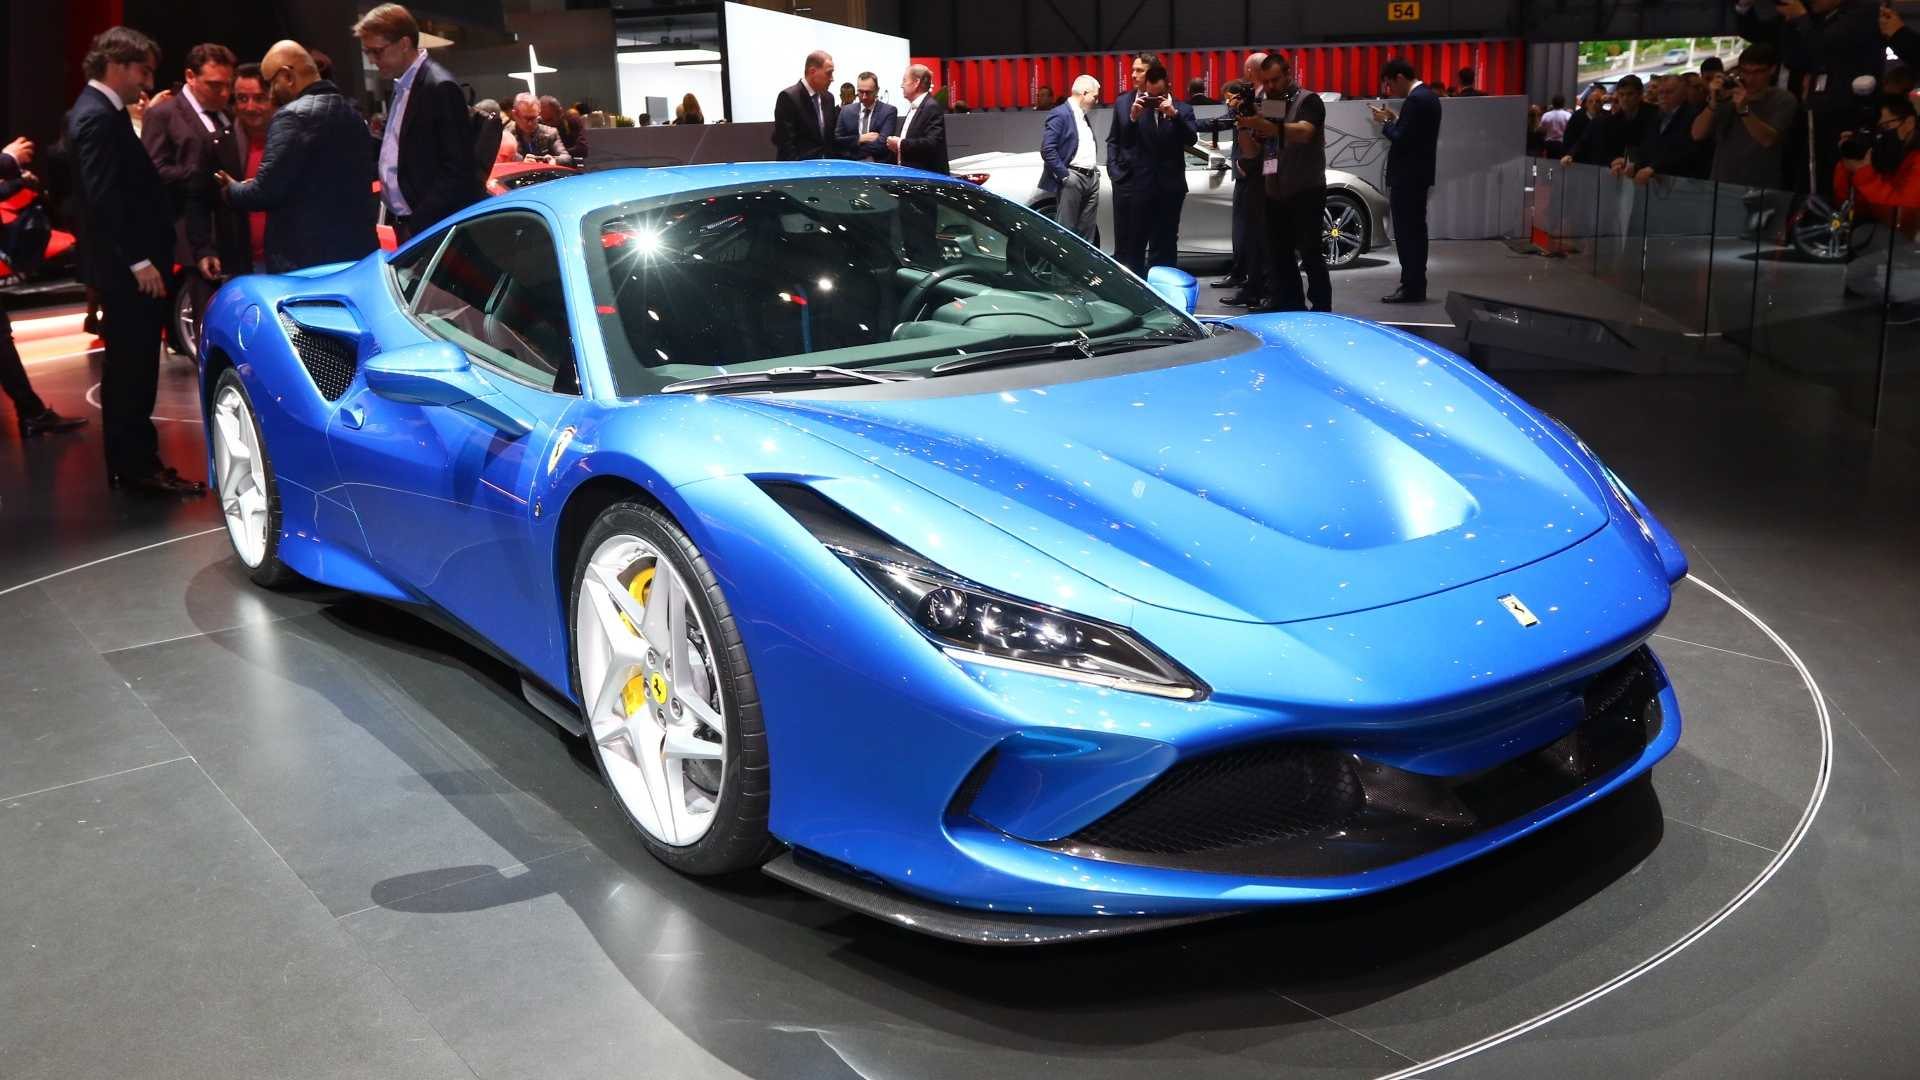 Ferrari F8 Tributo Arrives In Geneva With Pista Matching Power